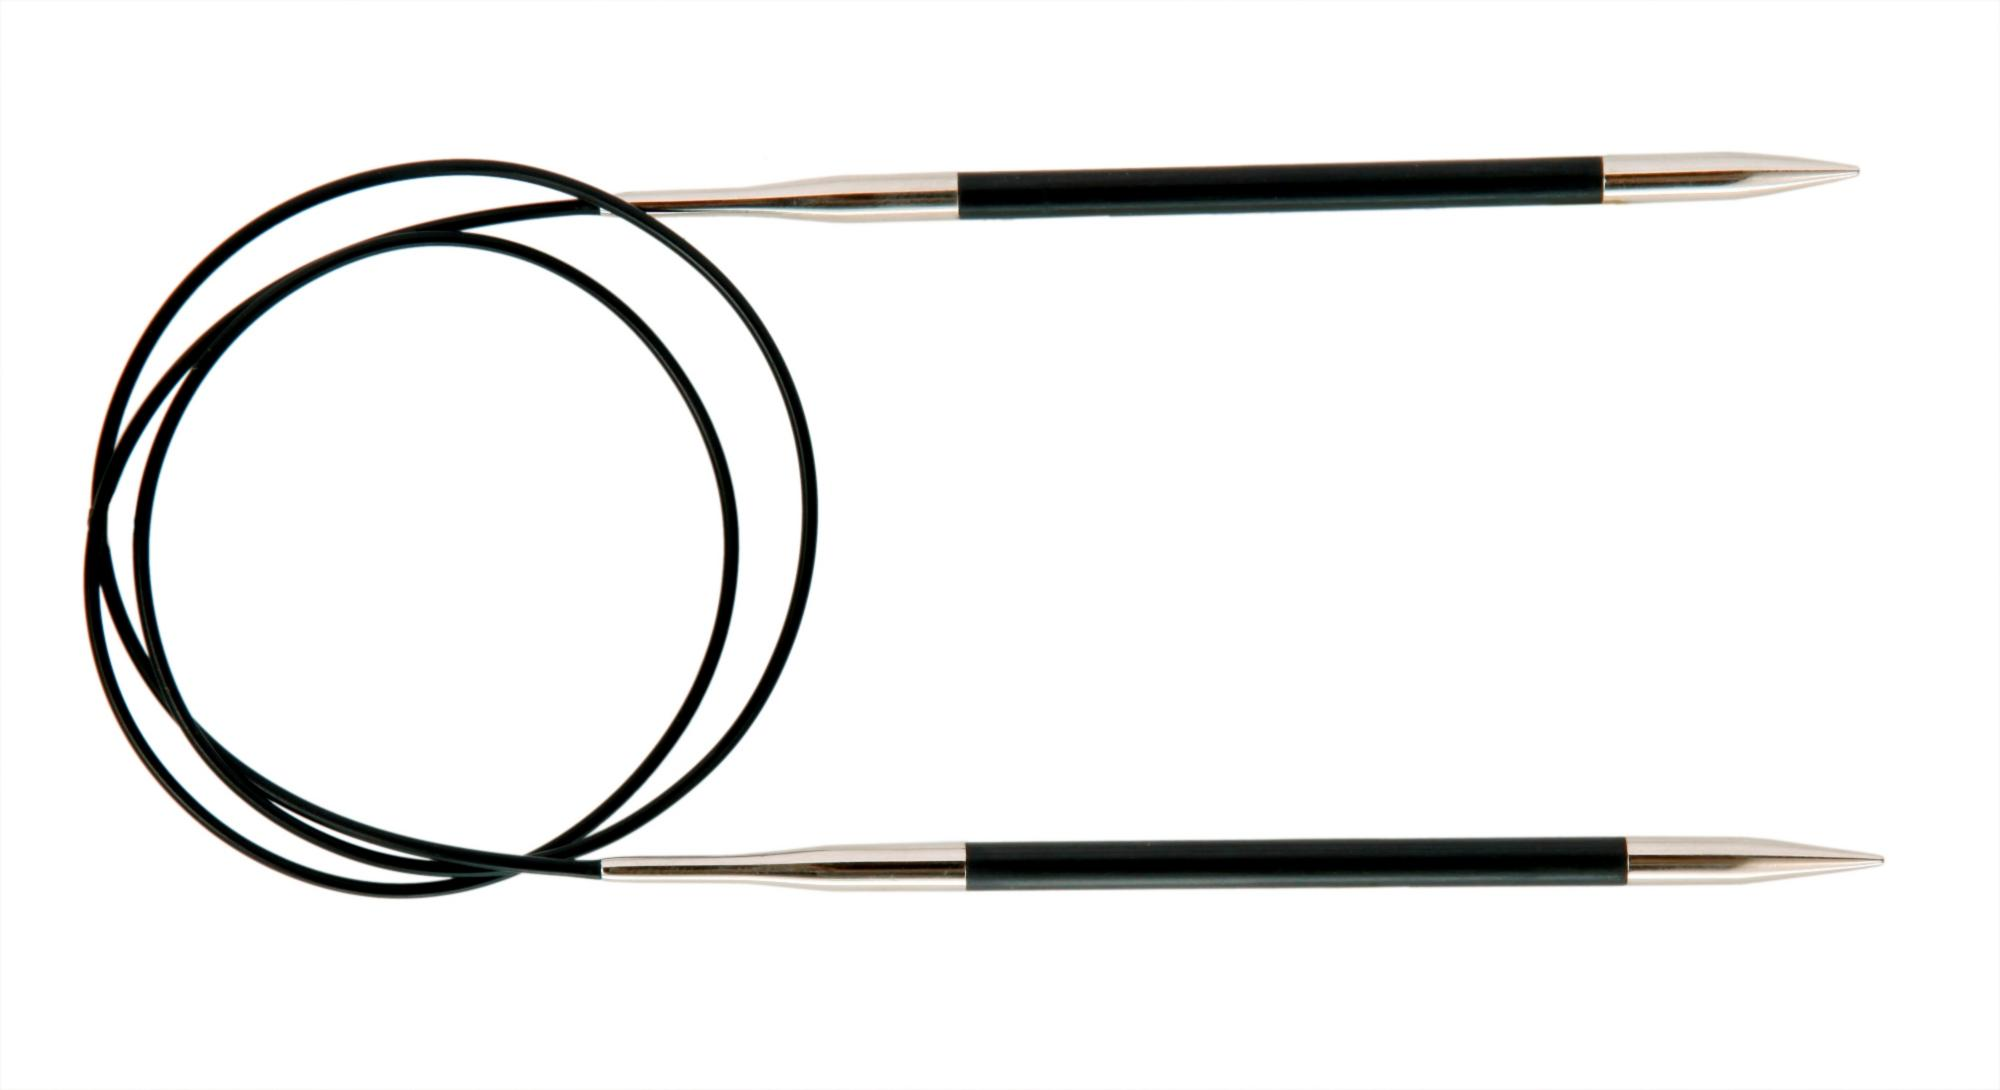 Спицы круговые 60 см Karbonz KnitPro, 41172, 6.00 мм